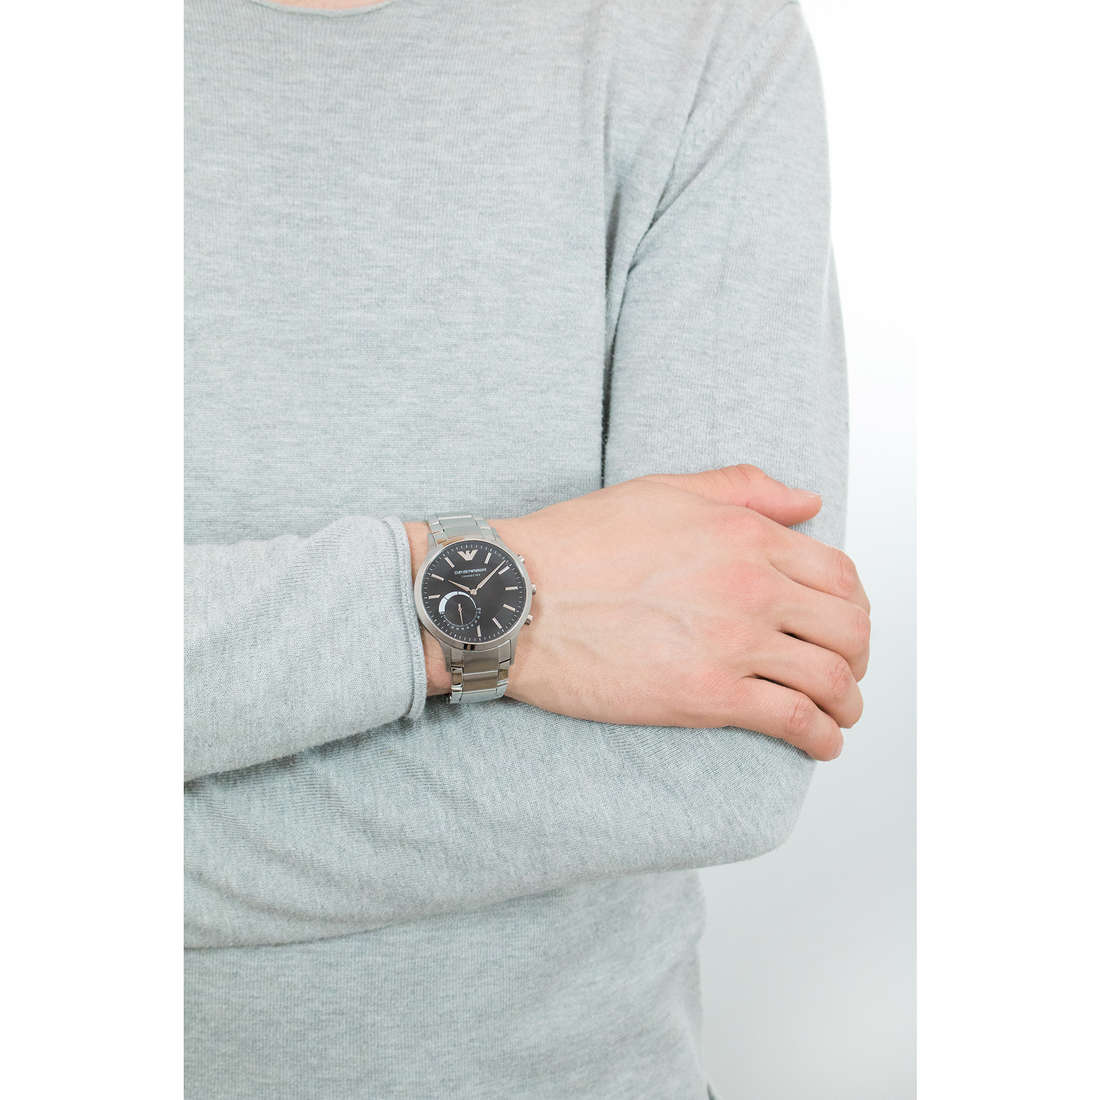 Emporio Armani Smartwatches uomo ART3000 indosso